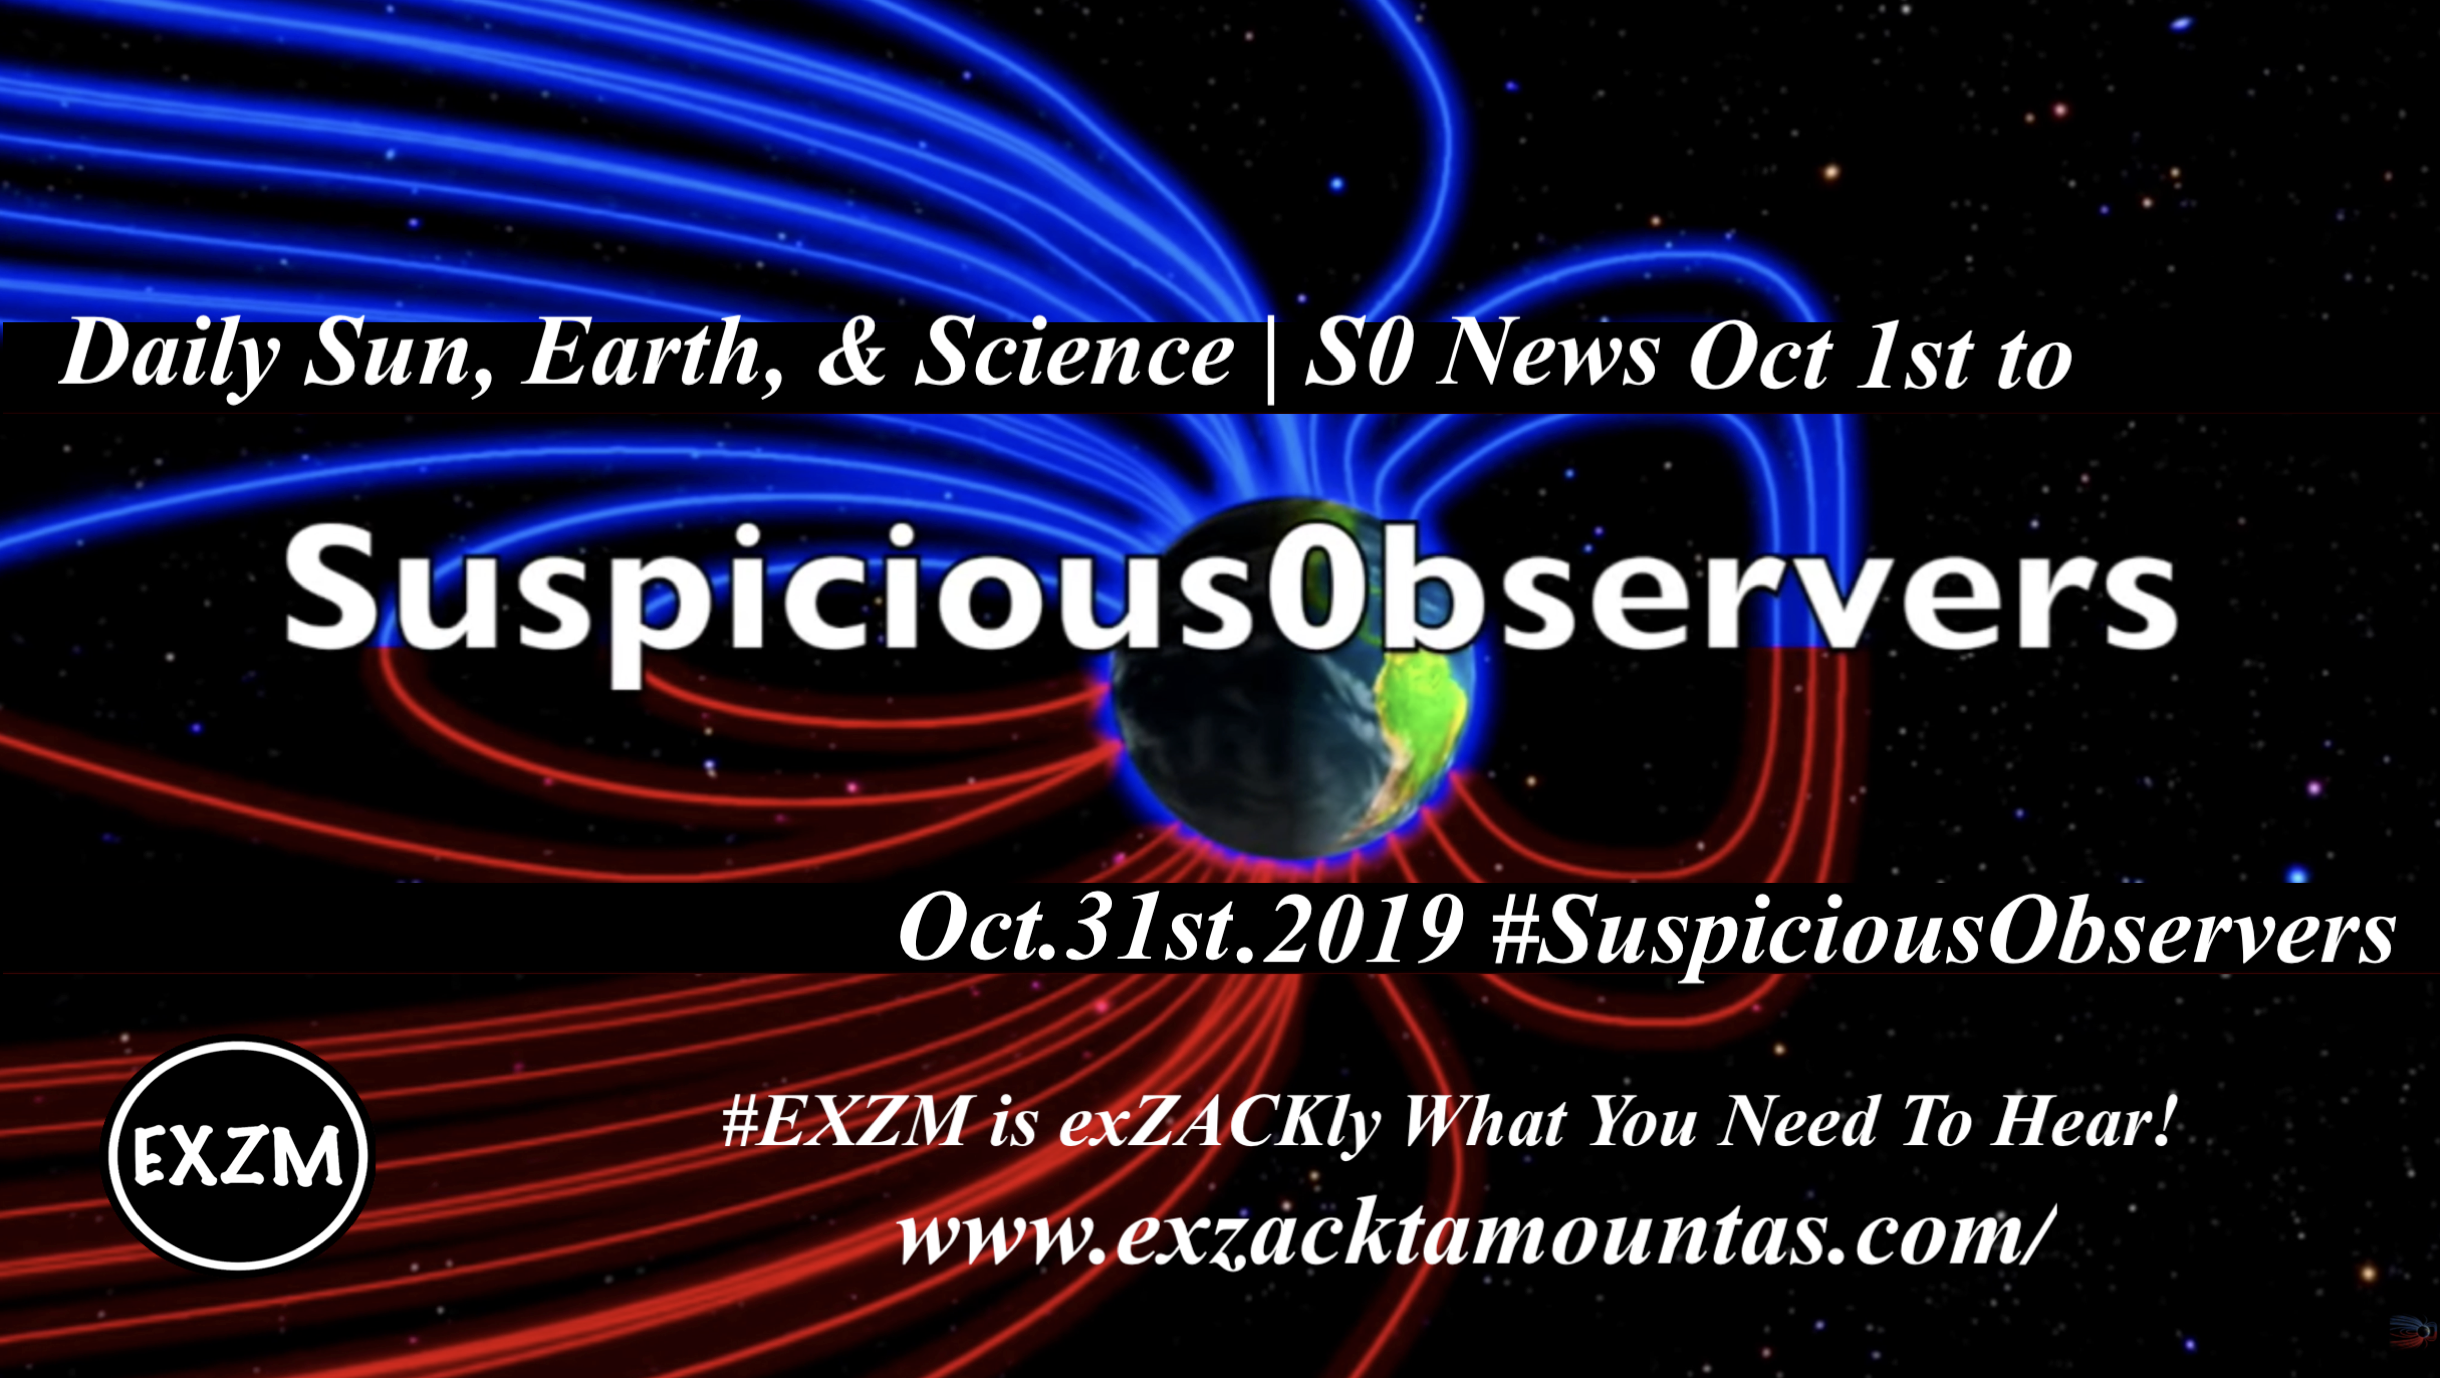 EXZM Suspicious Observers Oct1Oct31 11 15 2019